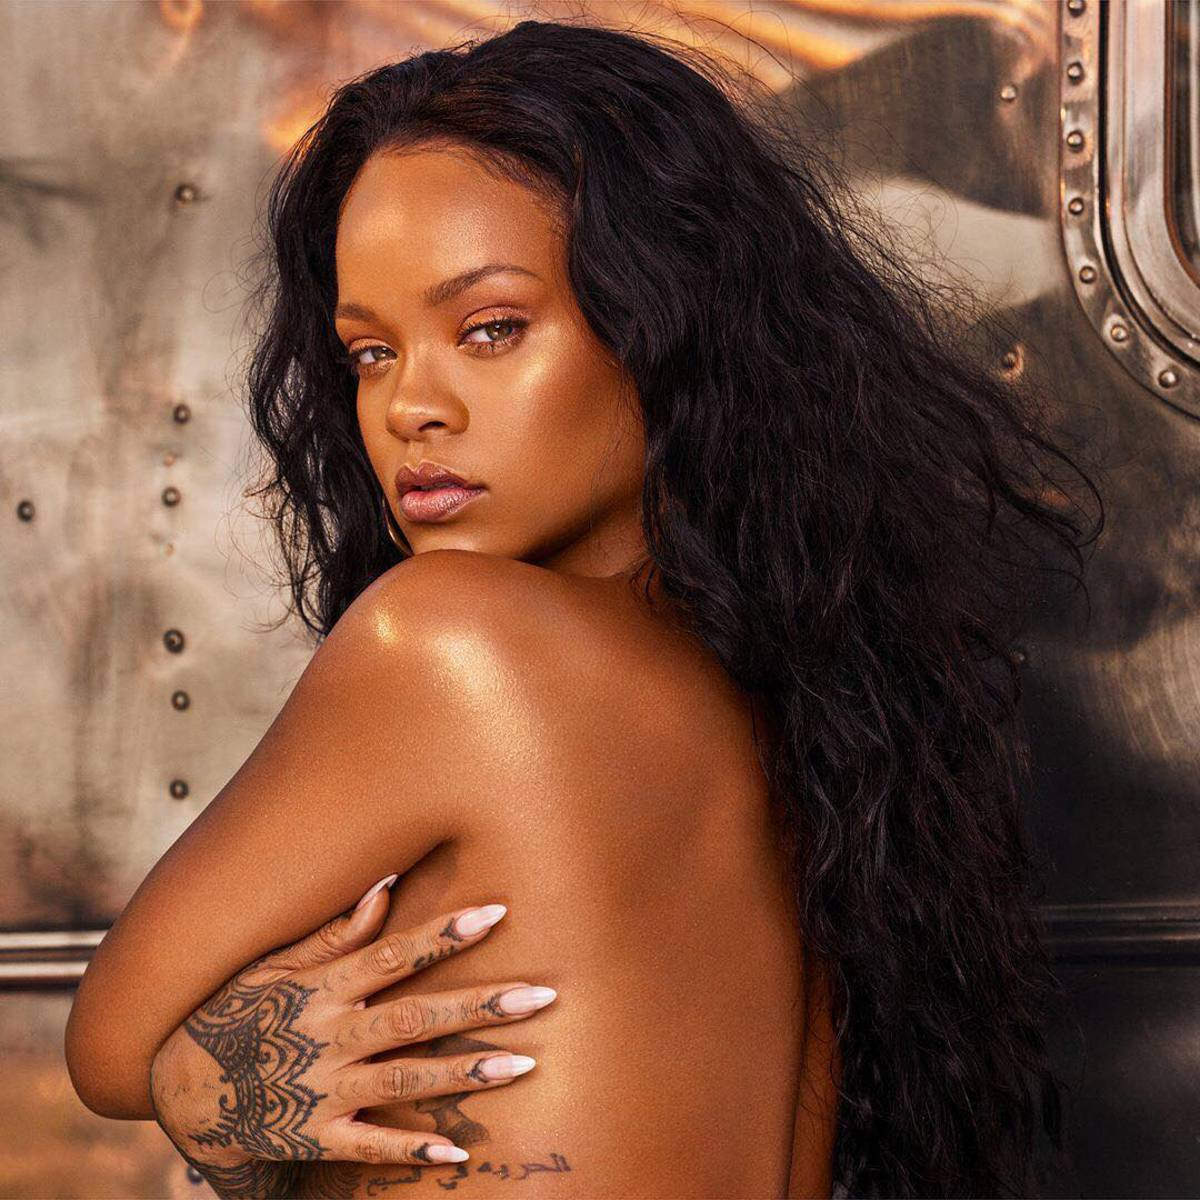 #RihannaChallenge rihanna